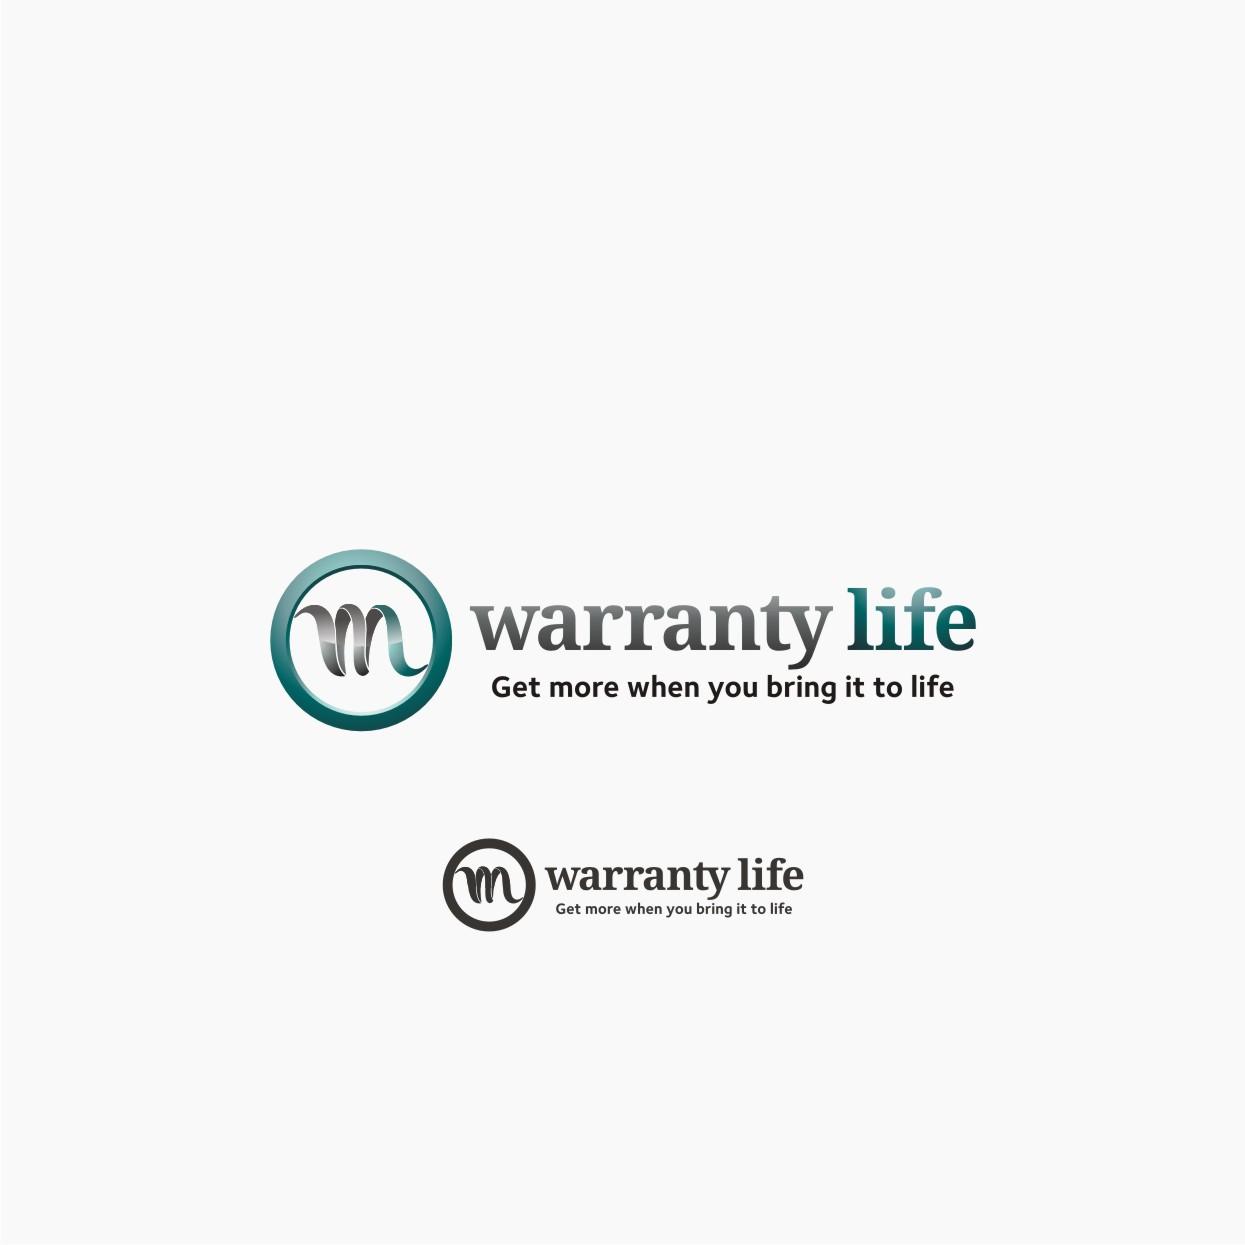 Logo Design by Muhammad Nasrul chasib - Entry No. 70 in the Logo Design Contest WarrantyLife Logo Design.